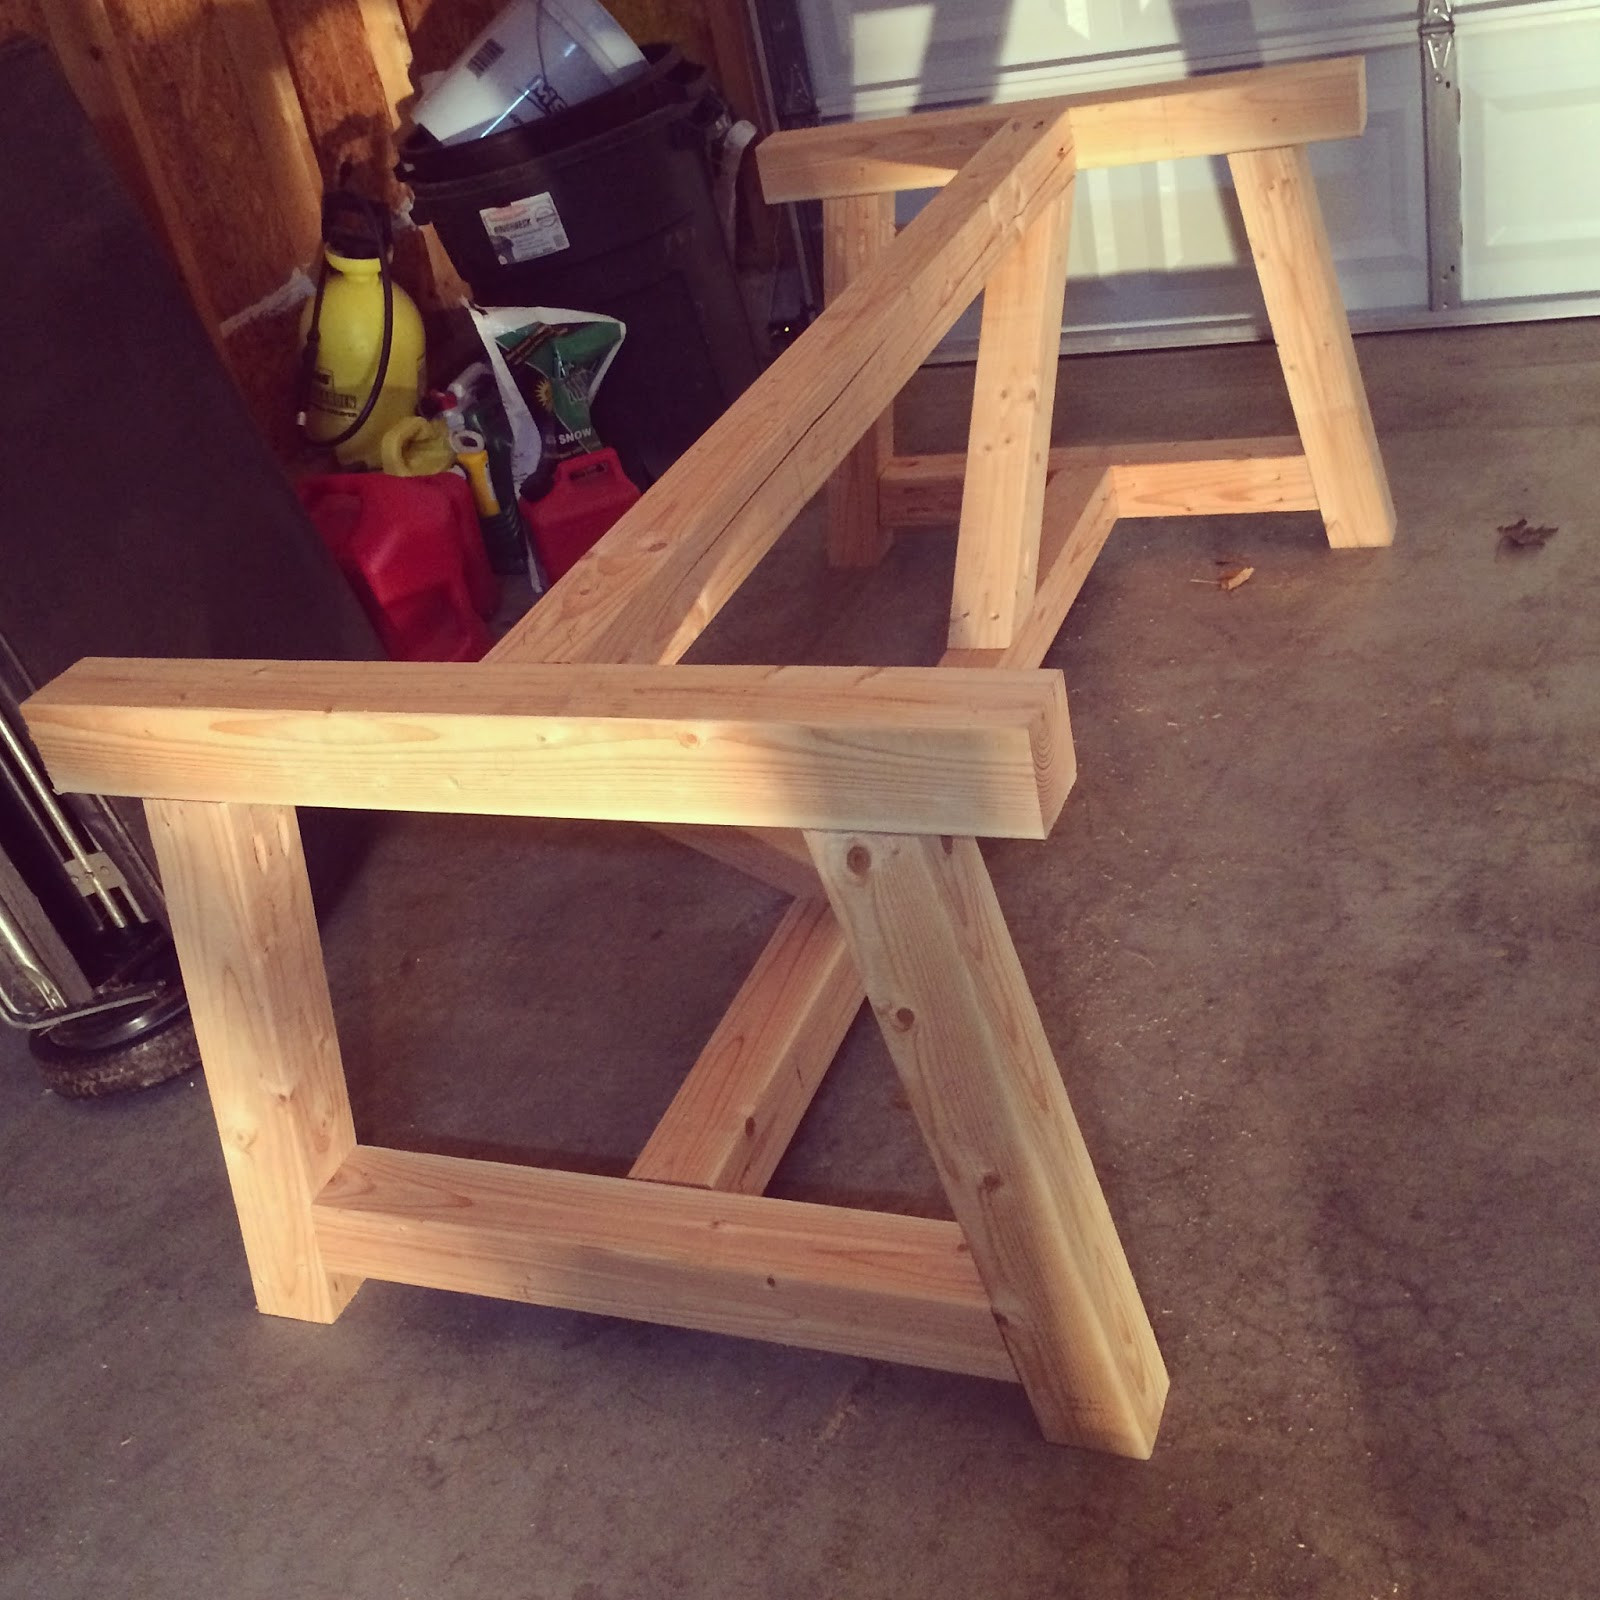 Best ideas about DIY Farmhouse Table Plans . Save or Pin Holy Cannoli We Built a Farmhouse Dining Room Table Now.